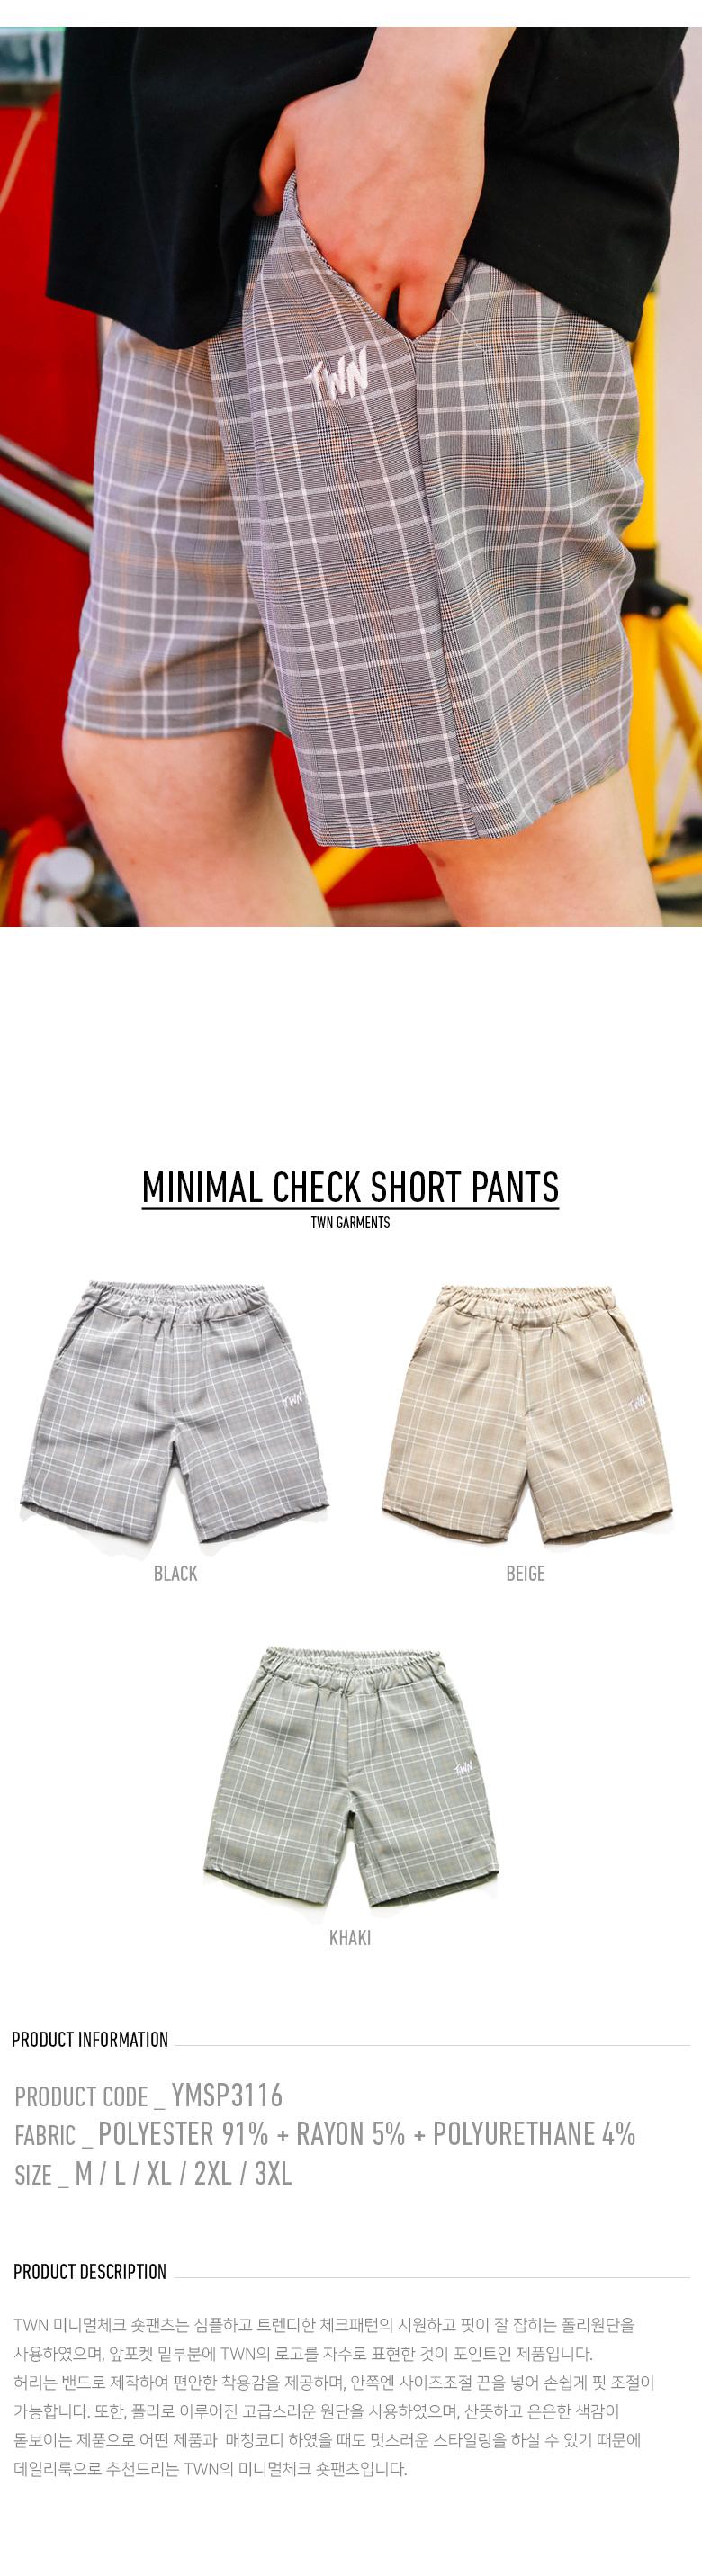 20190418_twn_minimal_pants_inrto_ym.jpg